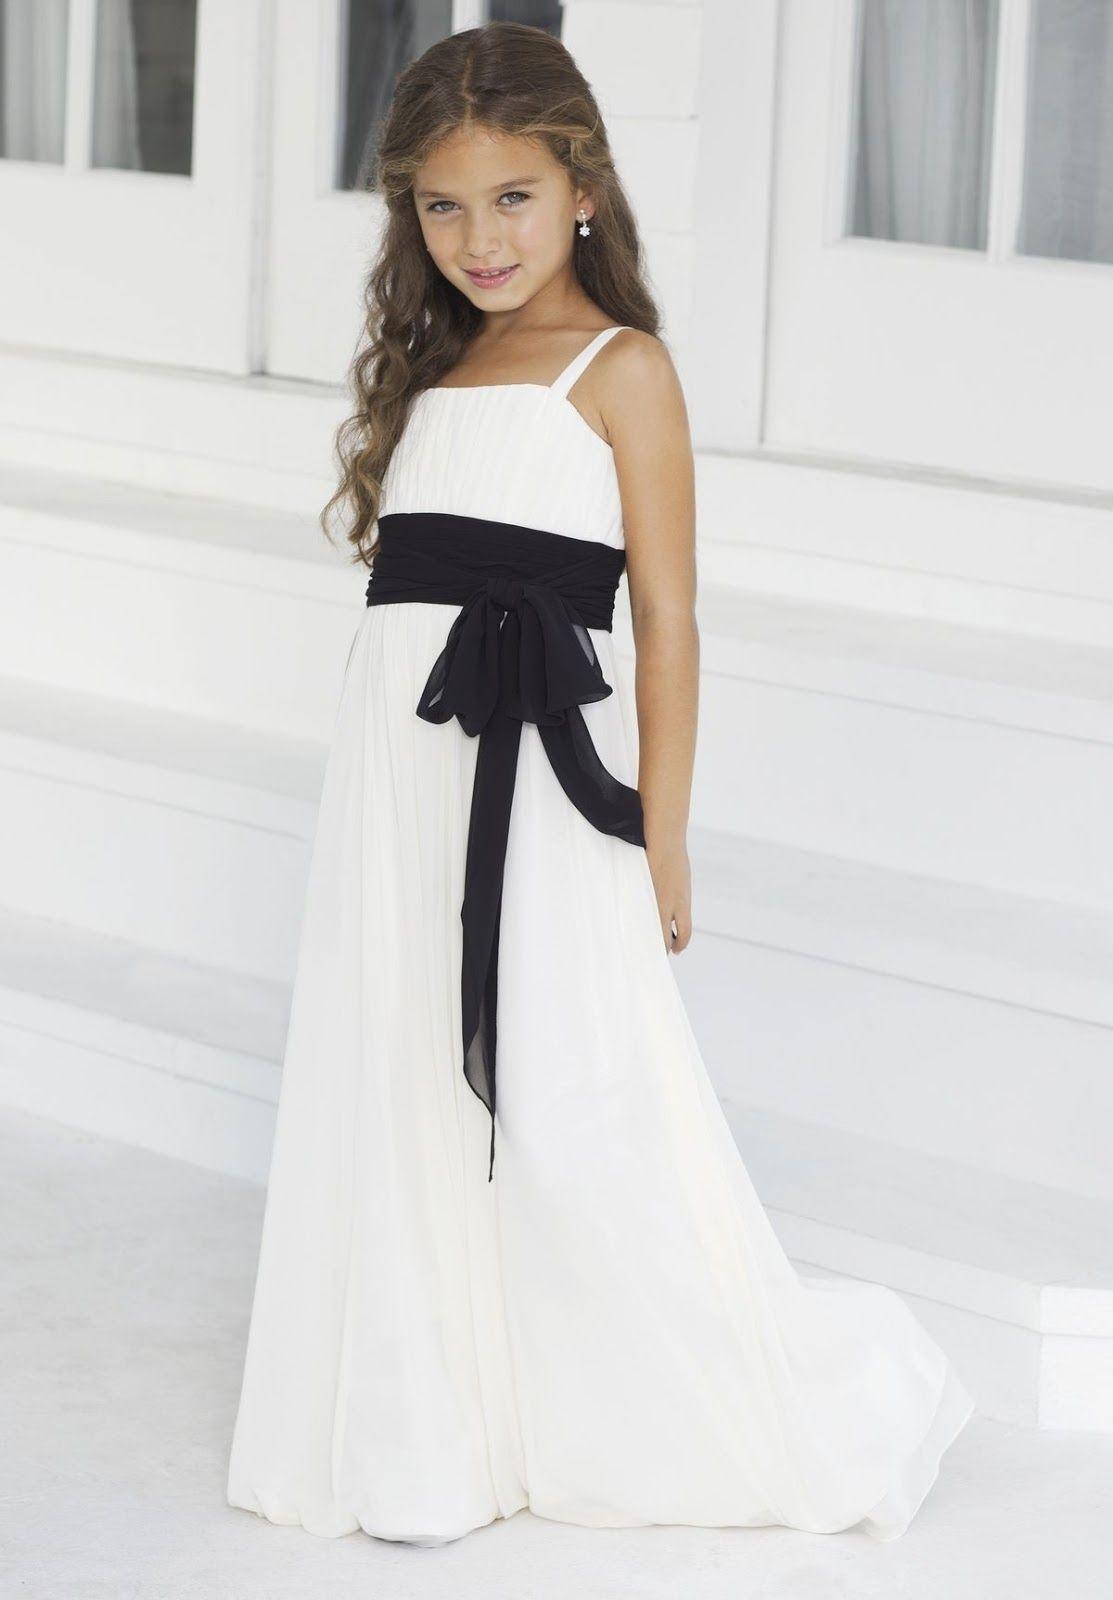 kids wedding dresses WhiteAzalea Junior Dresses Special Occasion Dresses for Kids